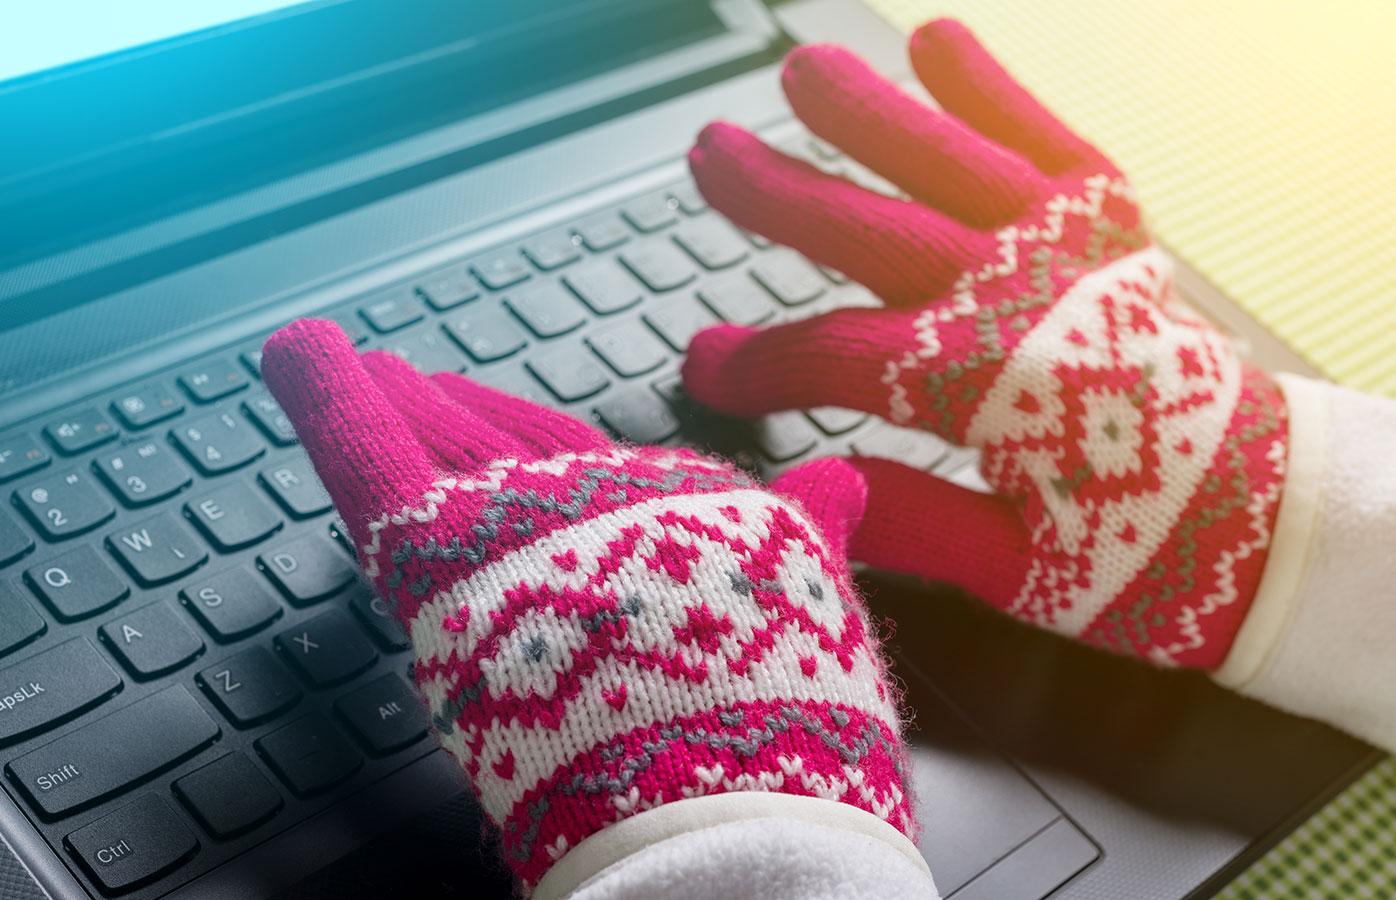 Barbs Wire - Women's brains work better in warmer offices, study finds